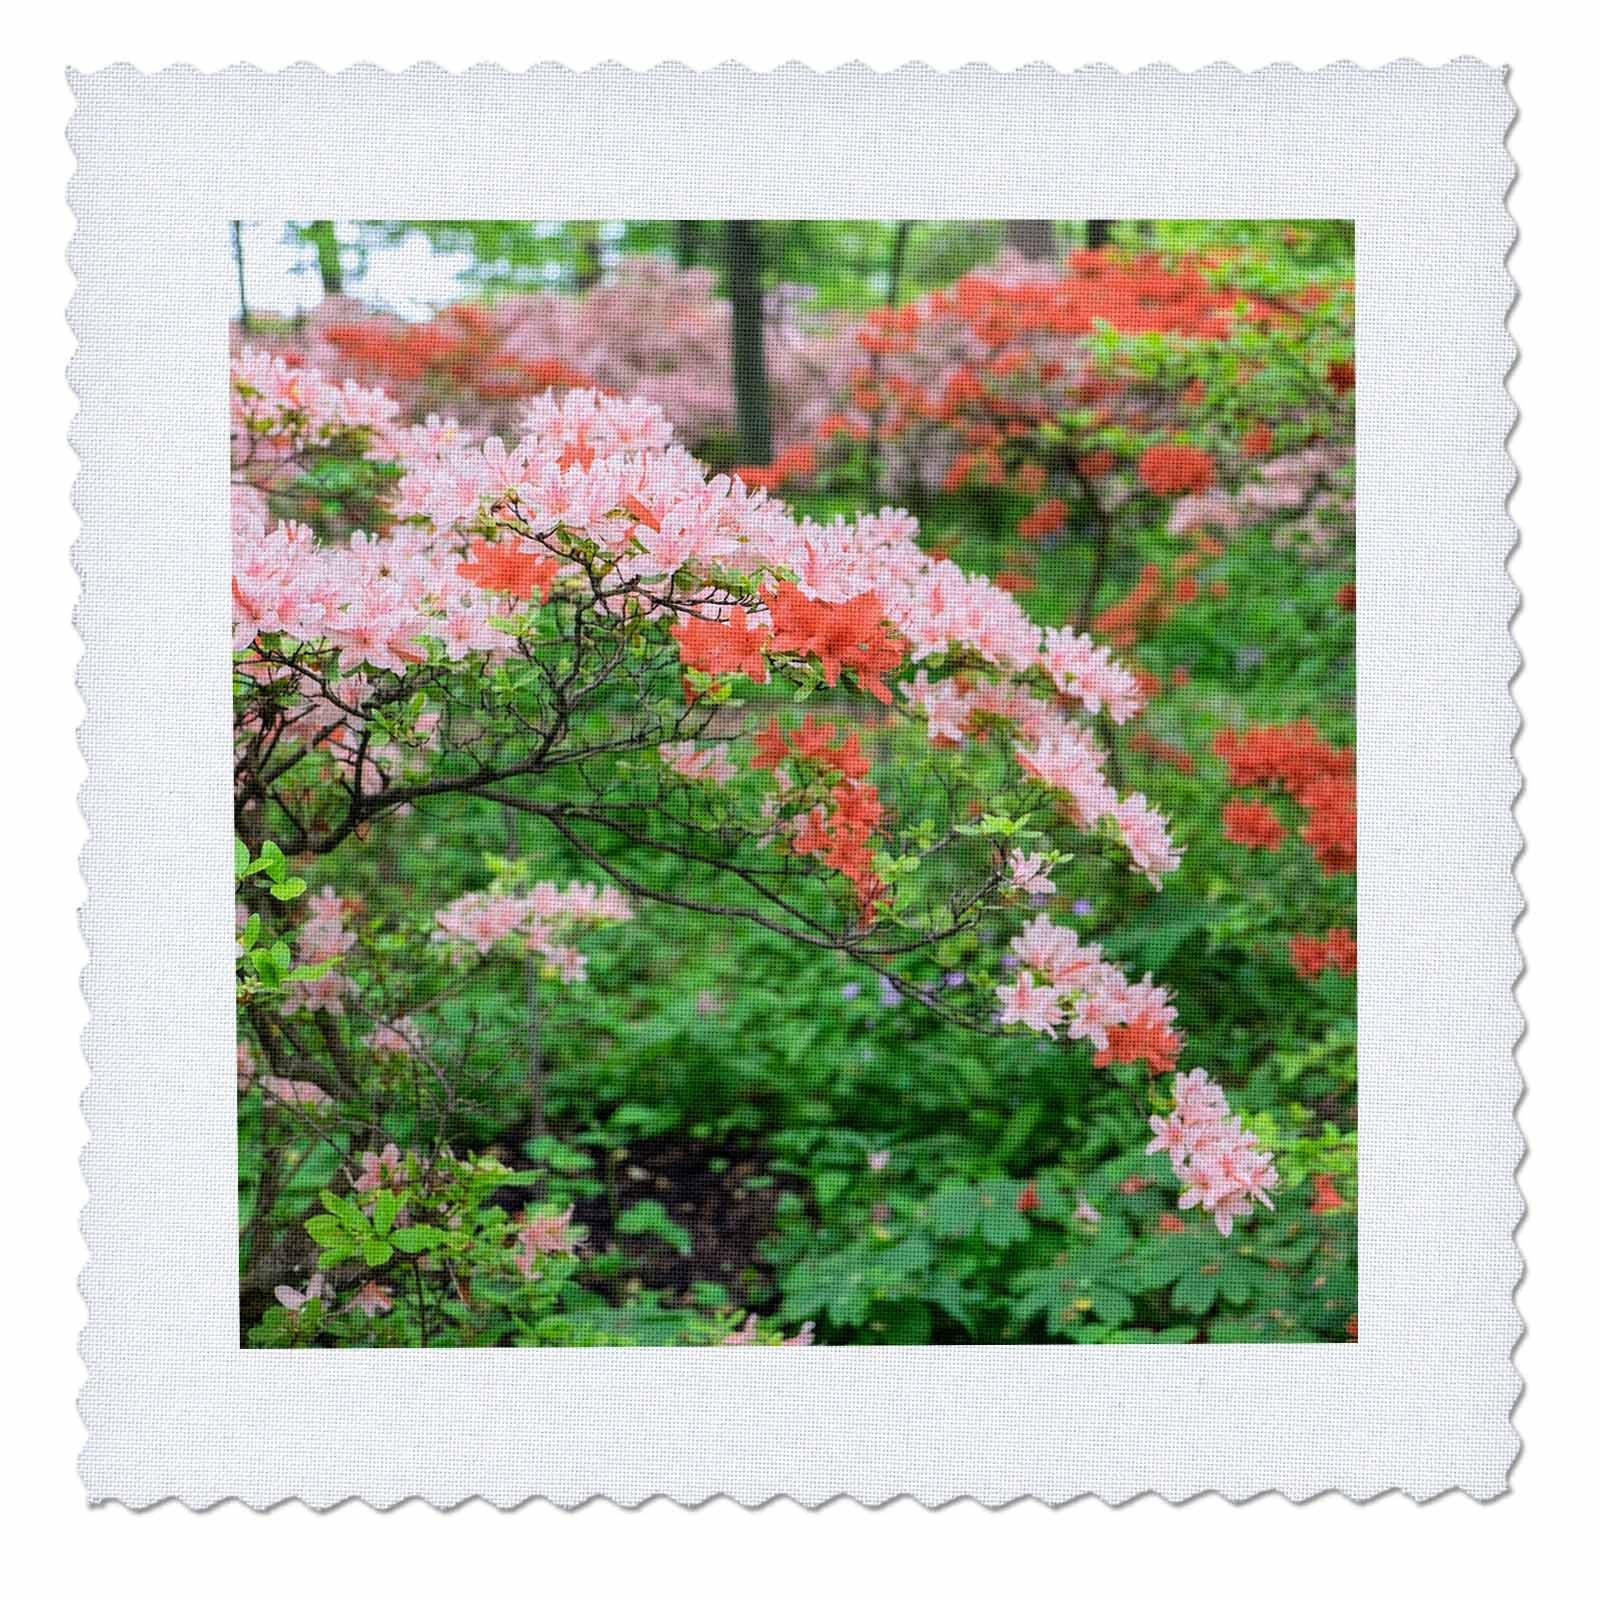 3dRose Danita Delimont - Forests - Pink Azaleas in Azalea Woods, Winterthur, Delaware, USA - 16x16 inch quilt square (qs_278837_6)